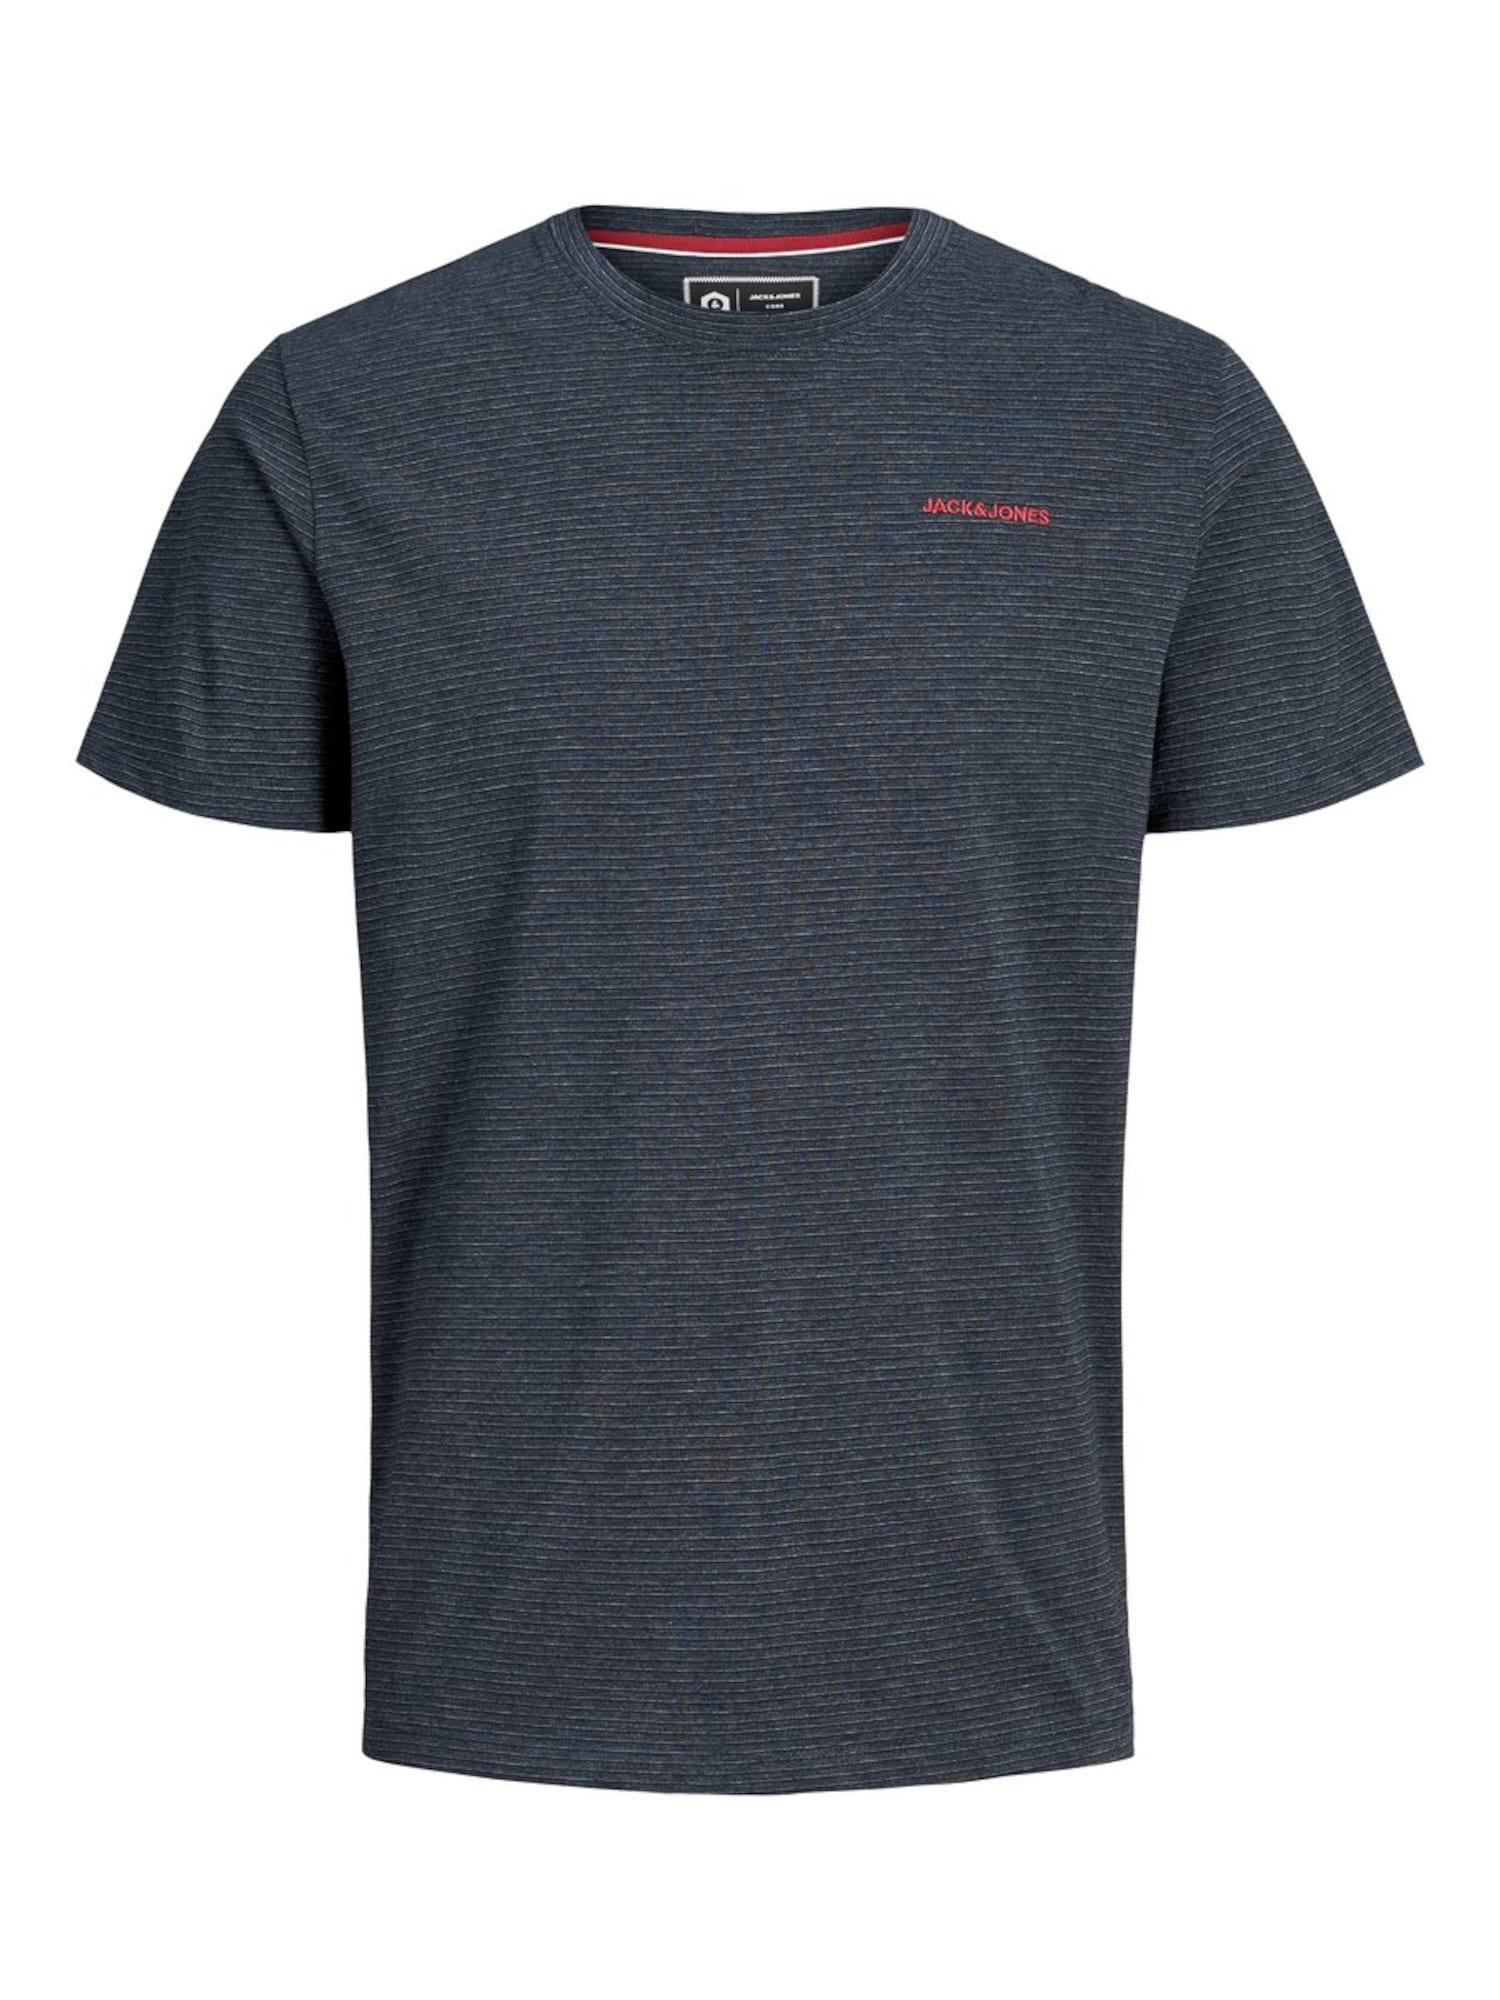 T-Shirt | Bekleidung > Shirts > Sonstige Shirts | jack & jones